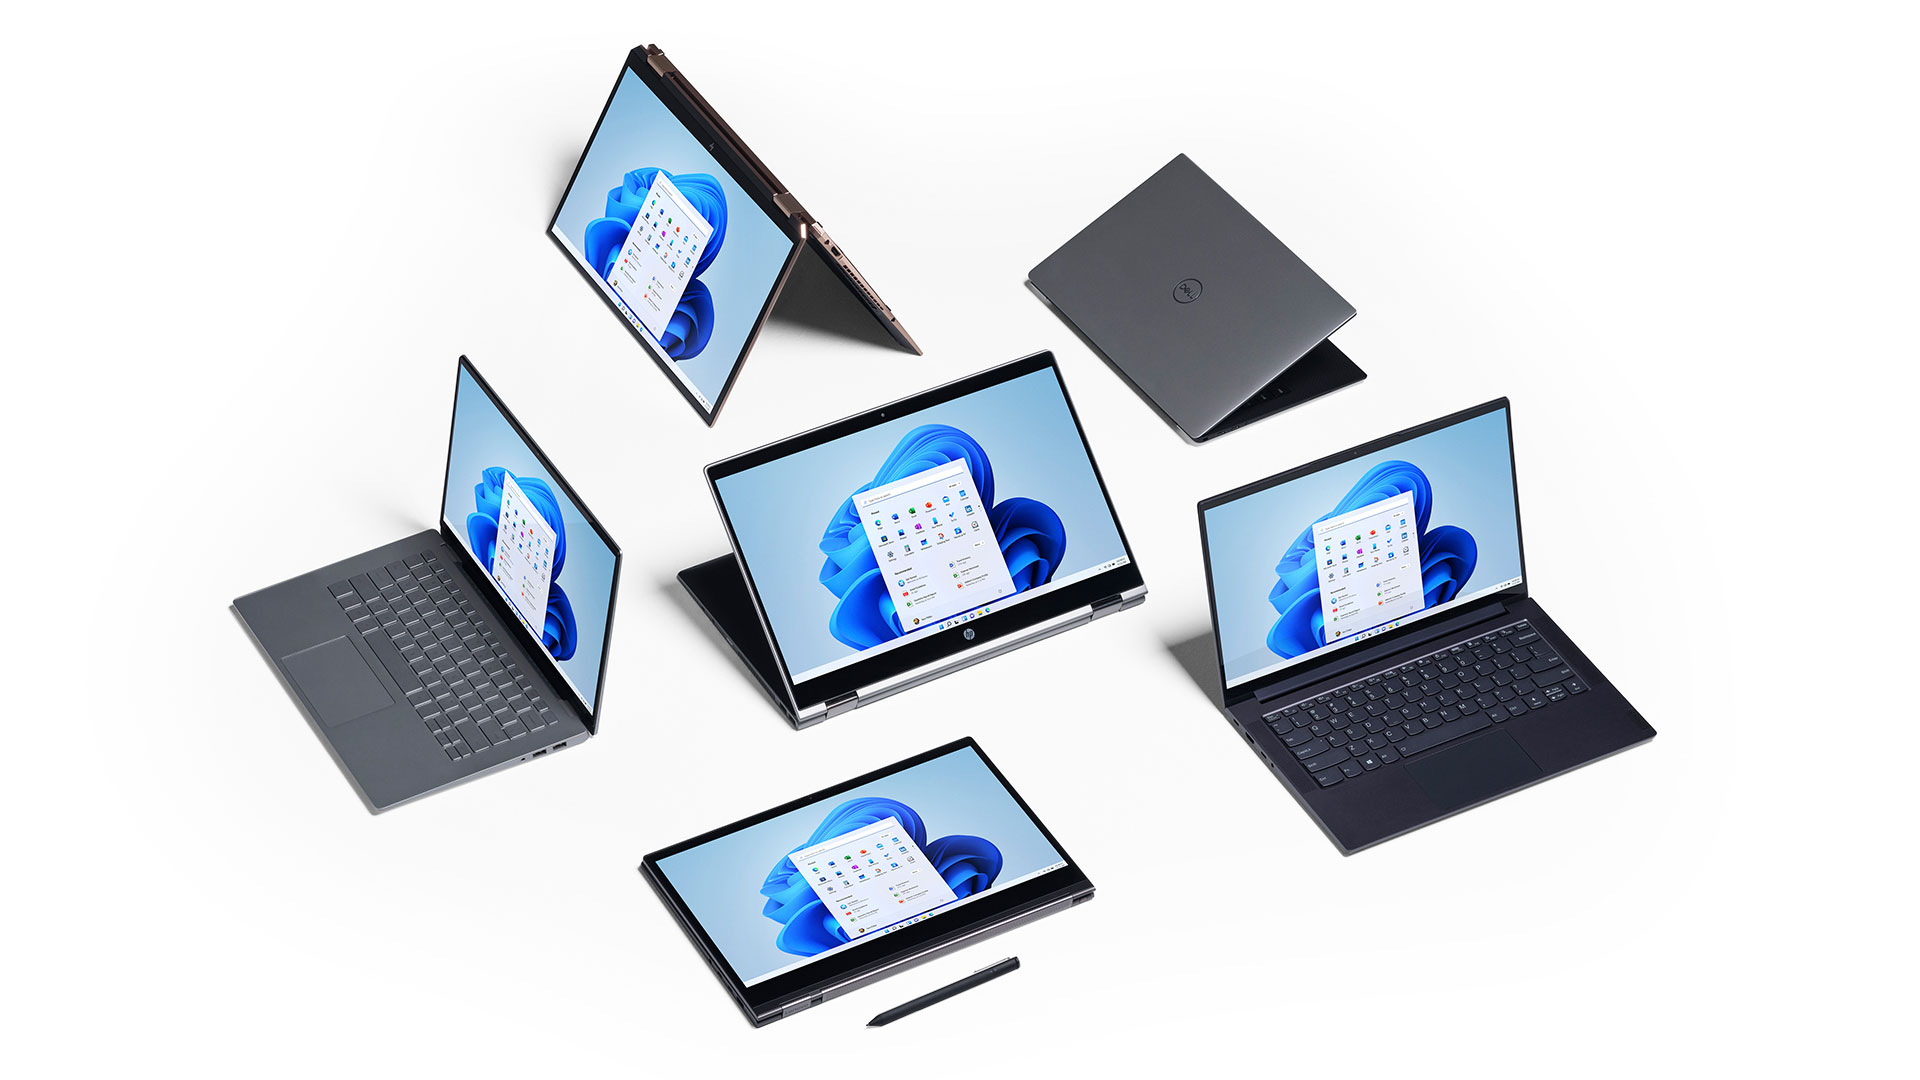 Gamme de six ordinateurs Windows 11